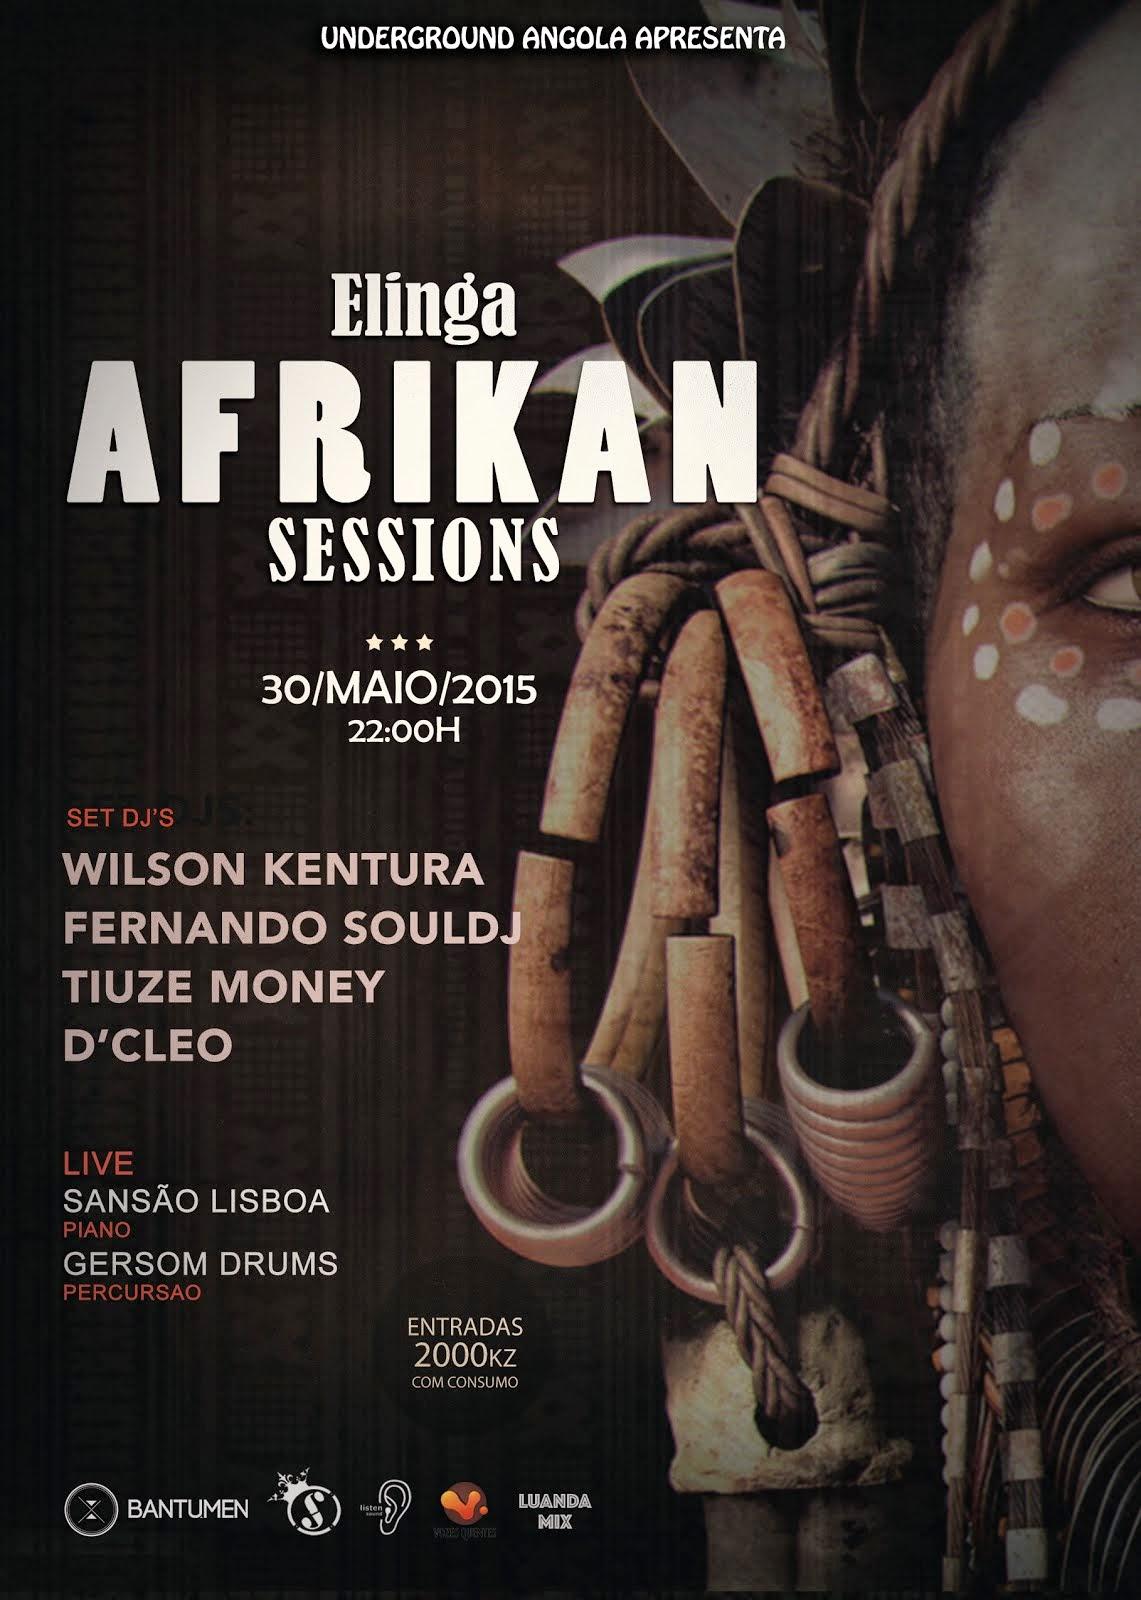 ELINGA AFRIKAN SESSIONS